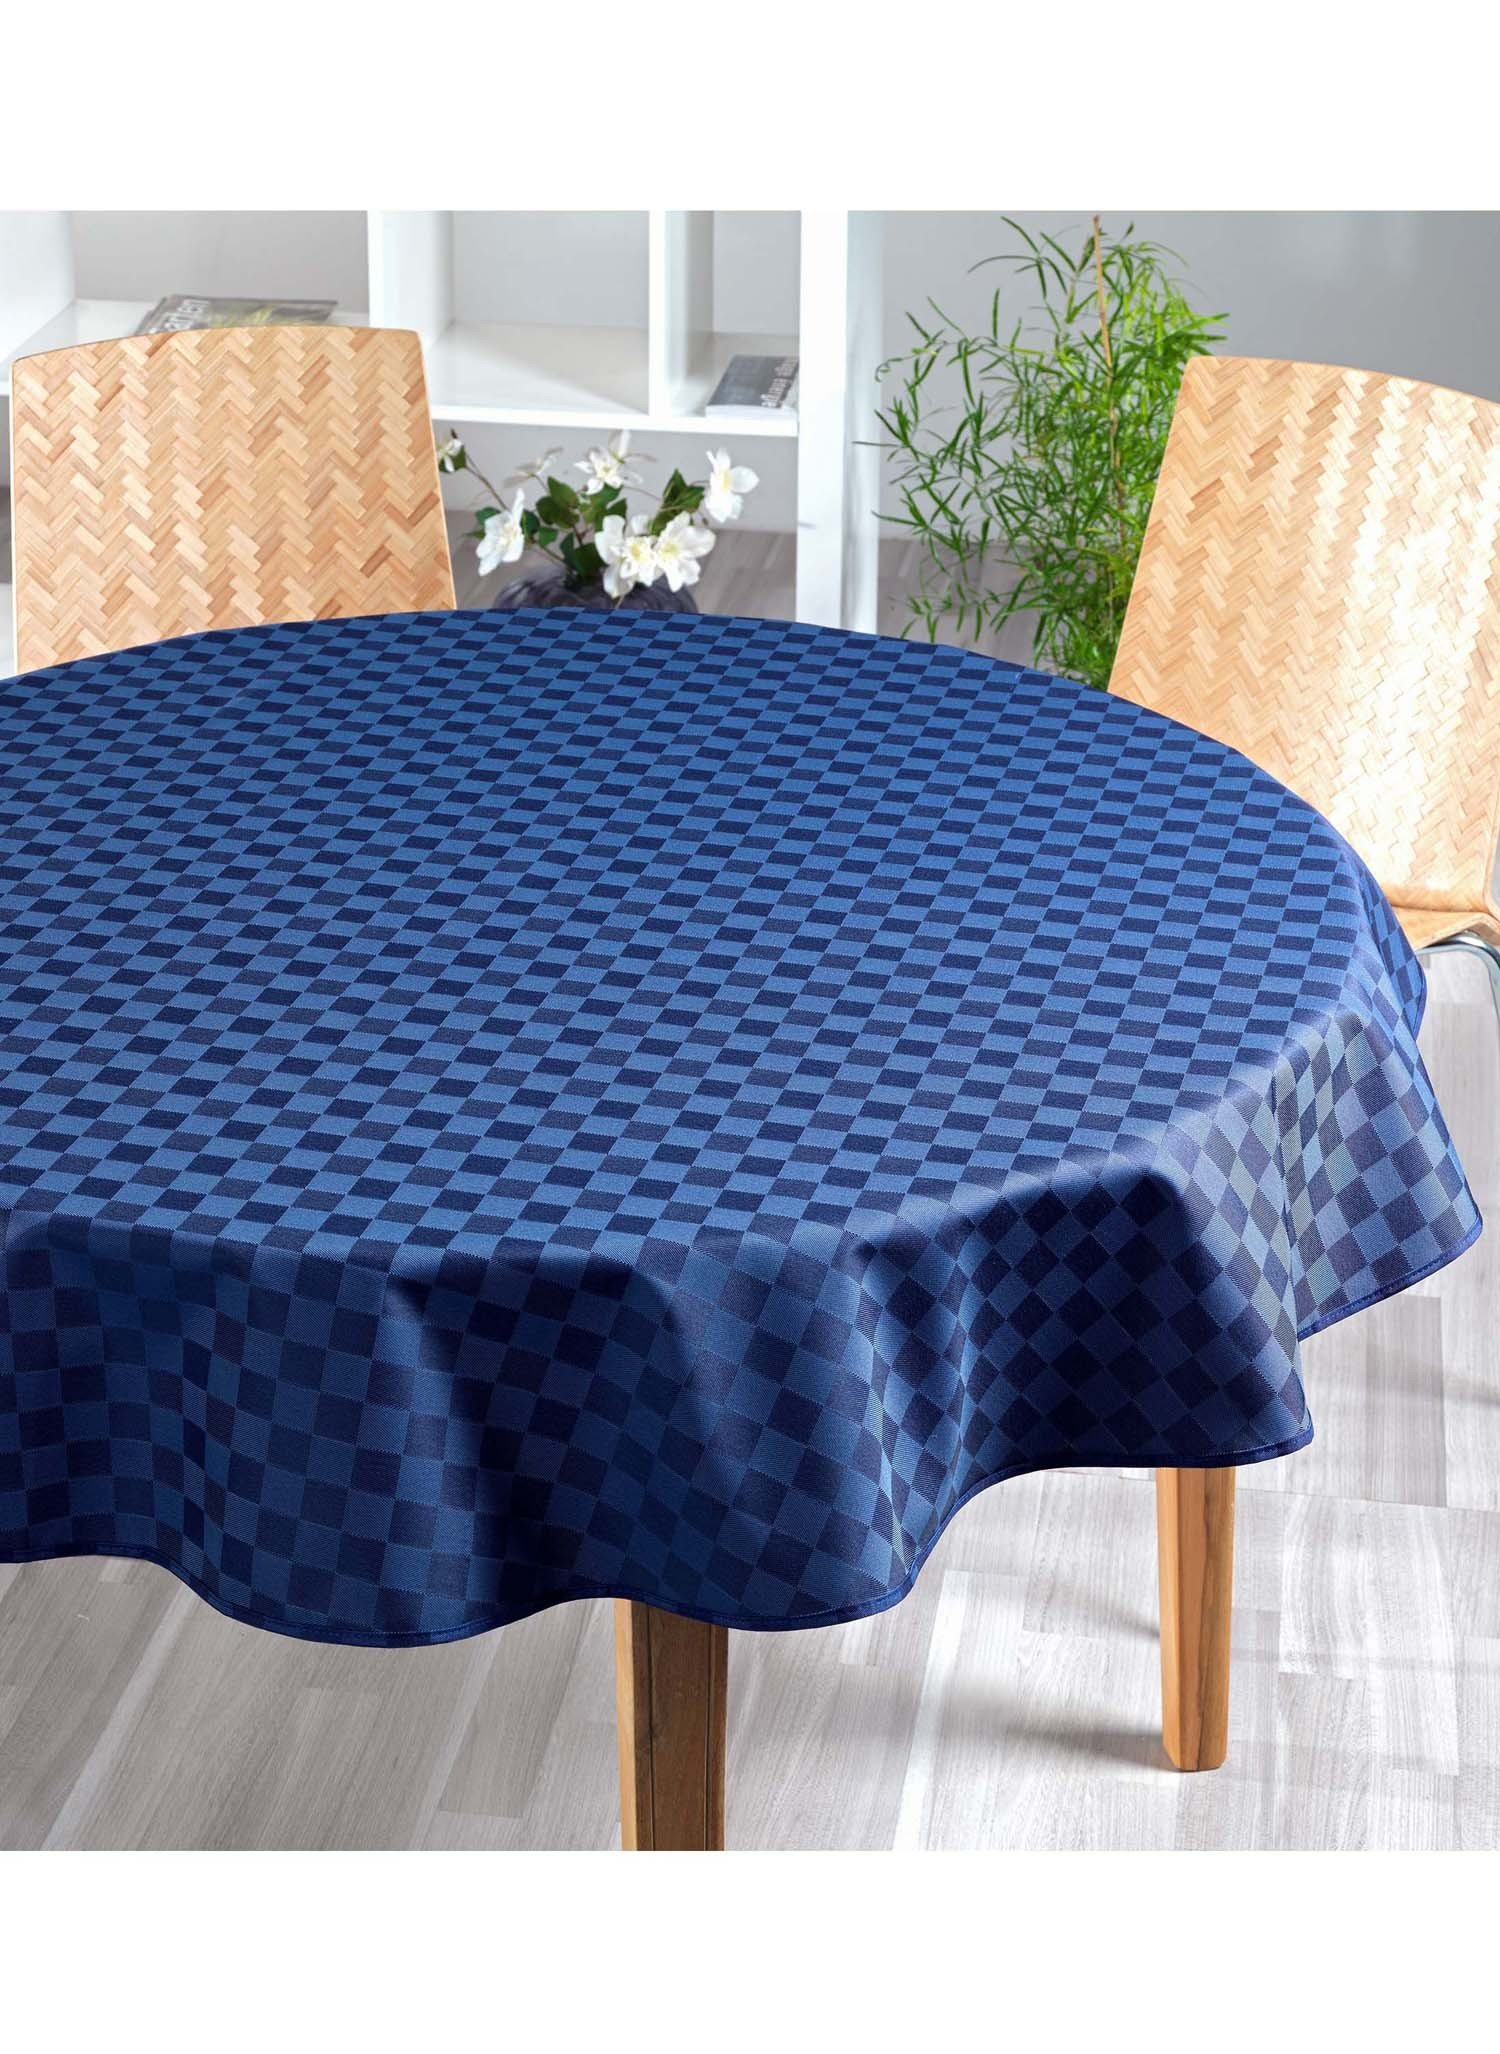 S-Tischd.J-Würfel blau 140x180